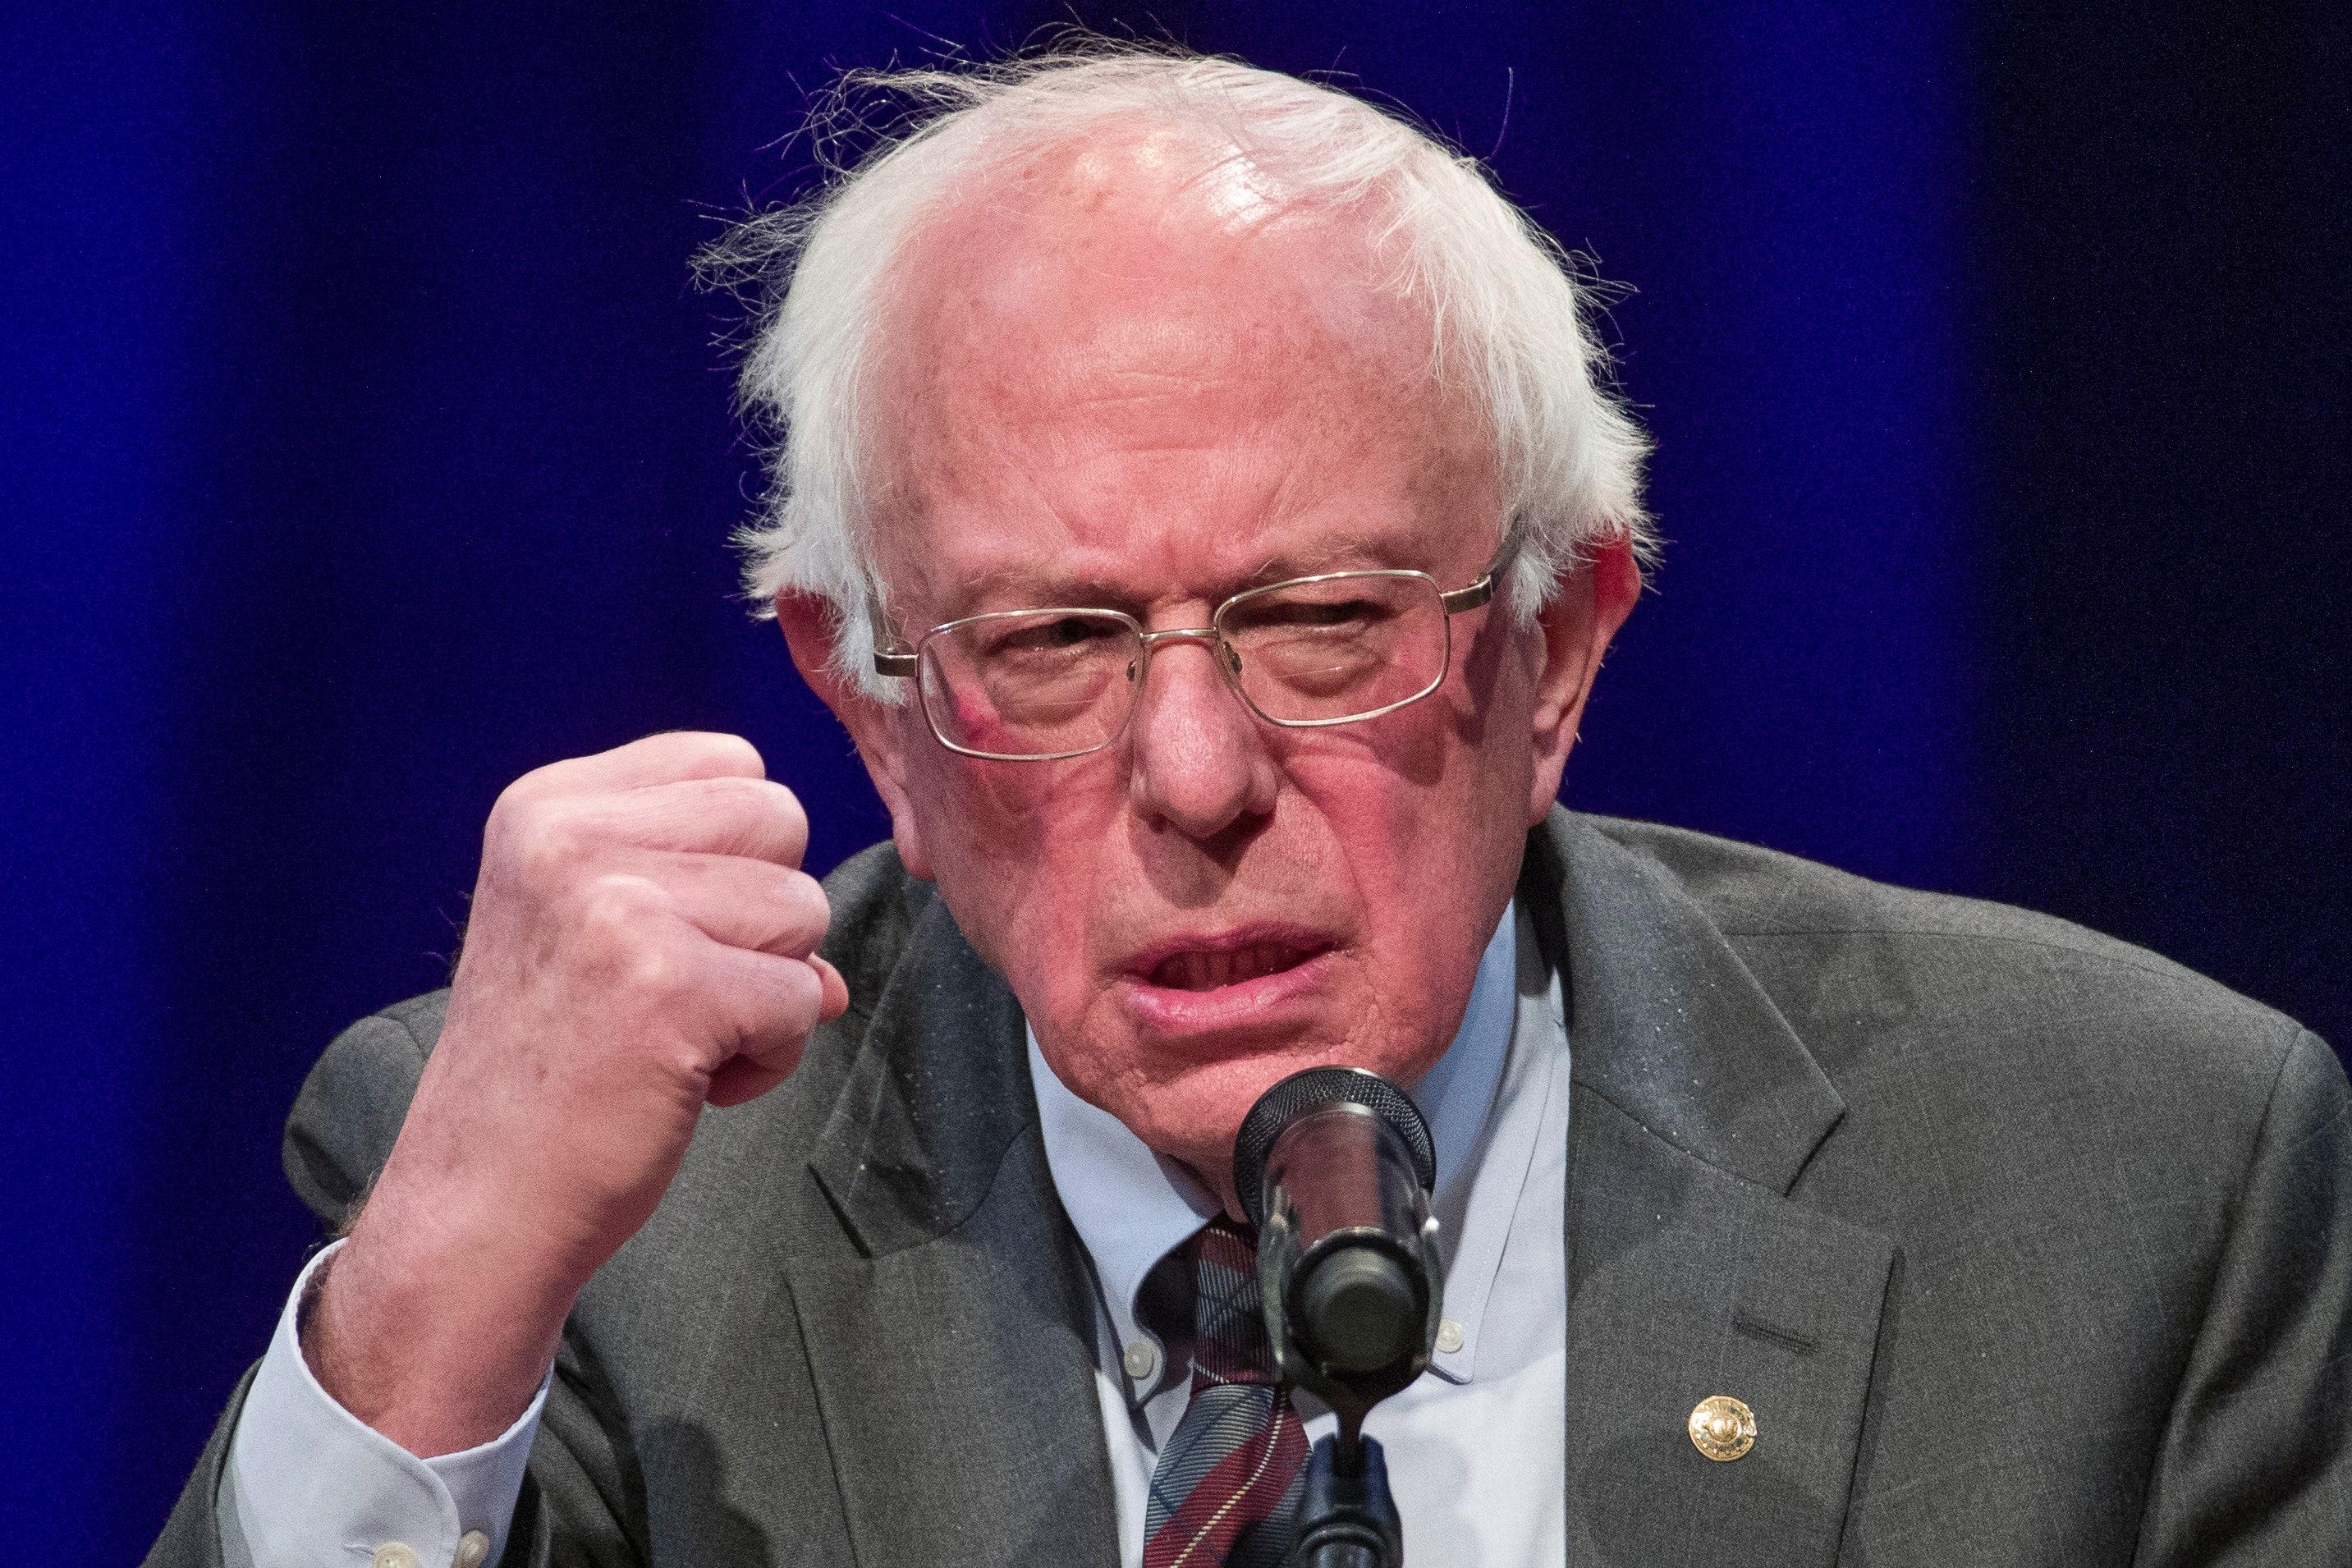 Vermont Sen. Bernie Sanders enters crowded 2020 presidential race